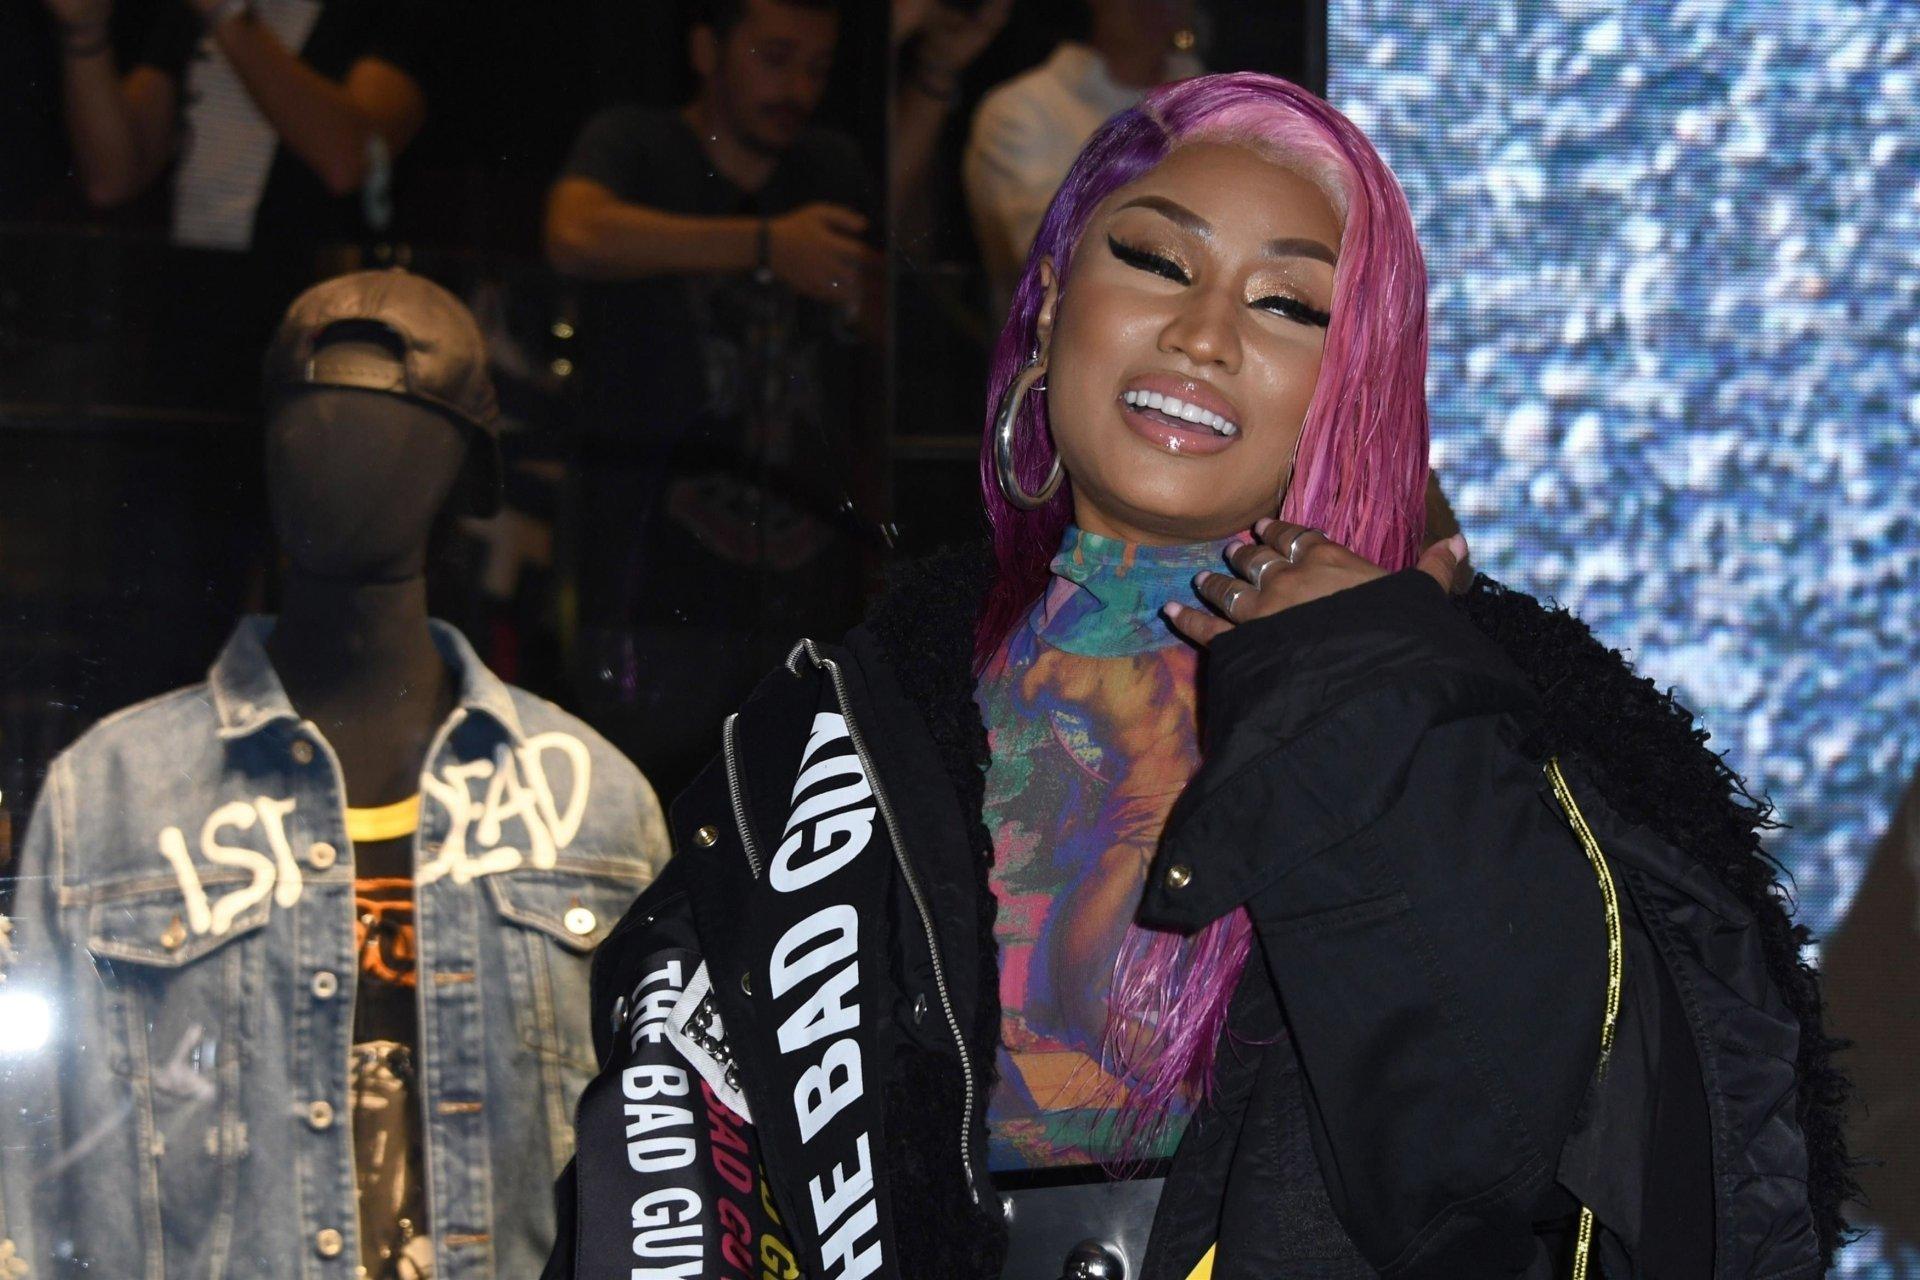 Nicki-Minaj-See-Through-TheFappeningBlog.com-10.jpg